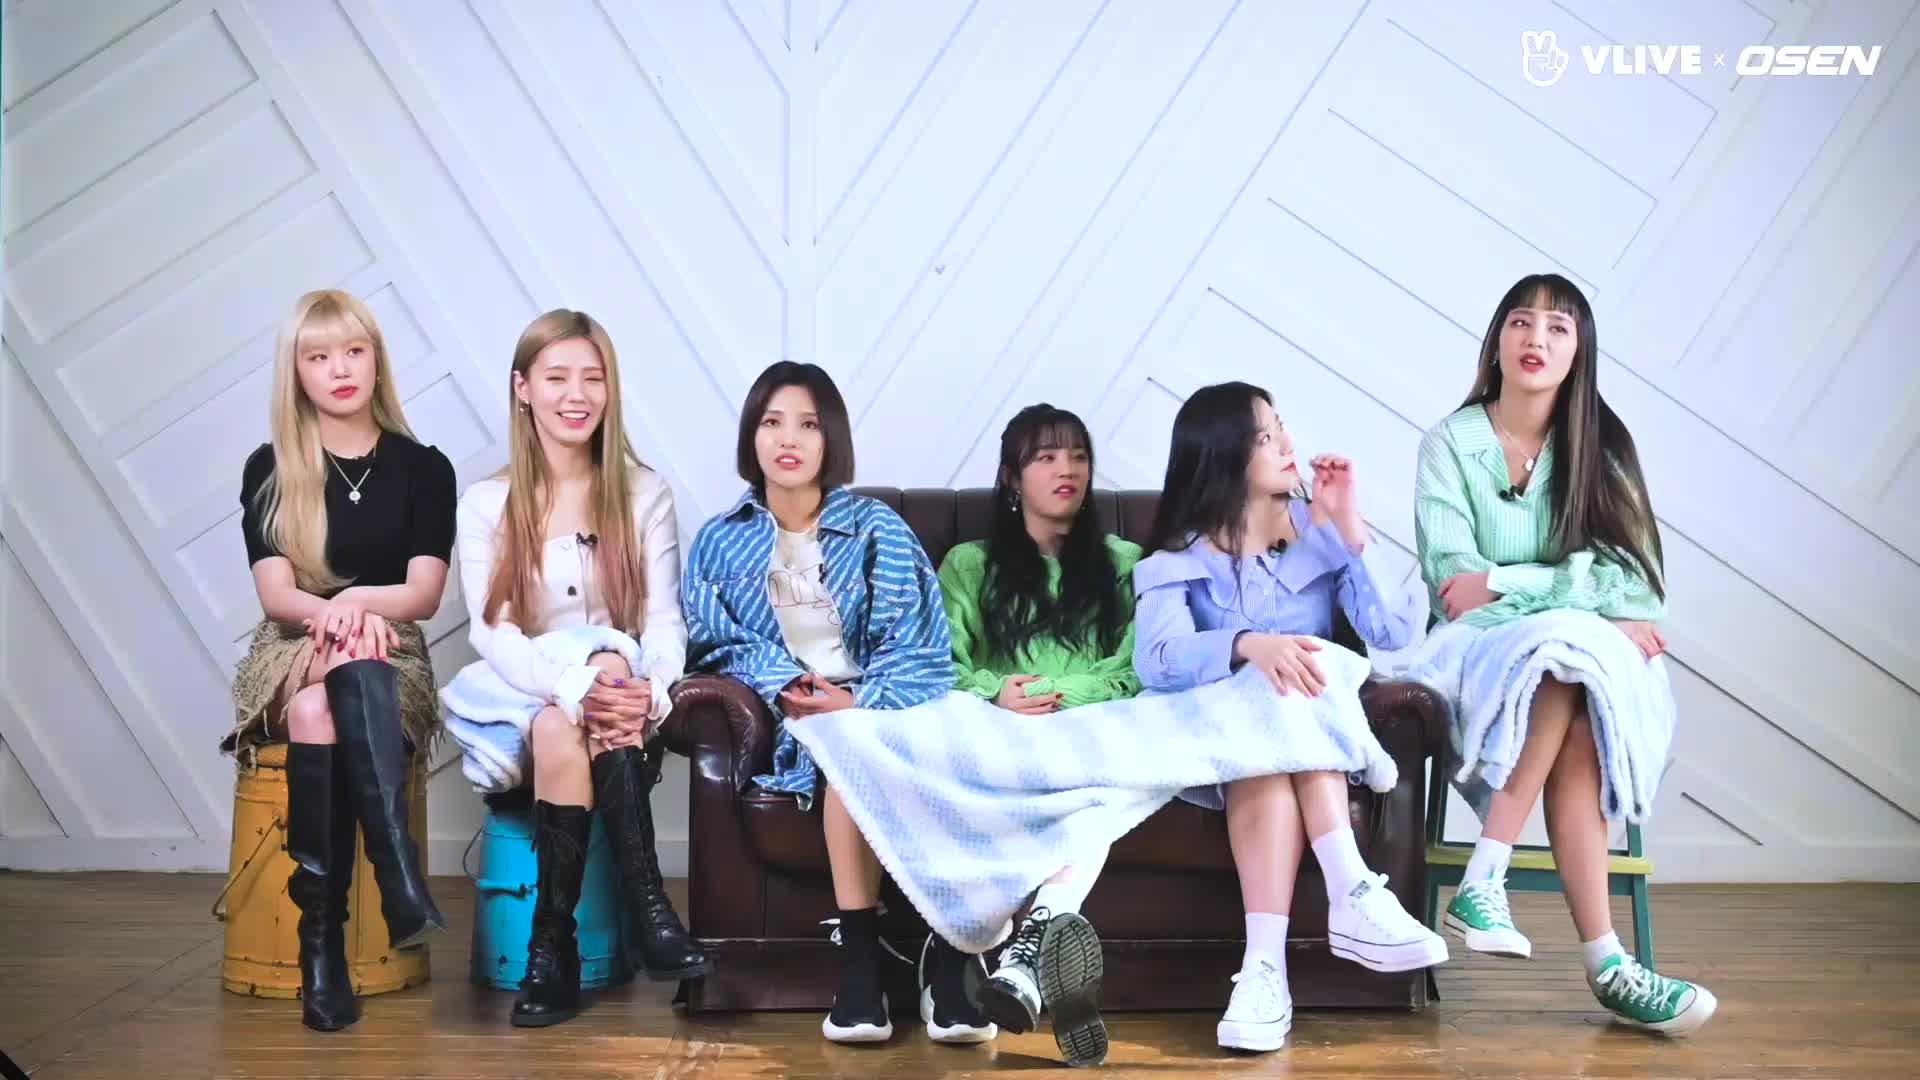 GIDLE (여자)아이들, TMI 대공개하며 '찐' 우정 인증 #스타로드 03